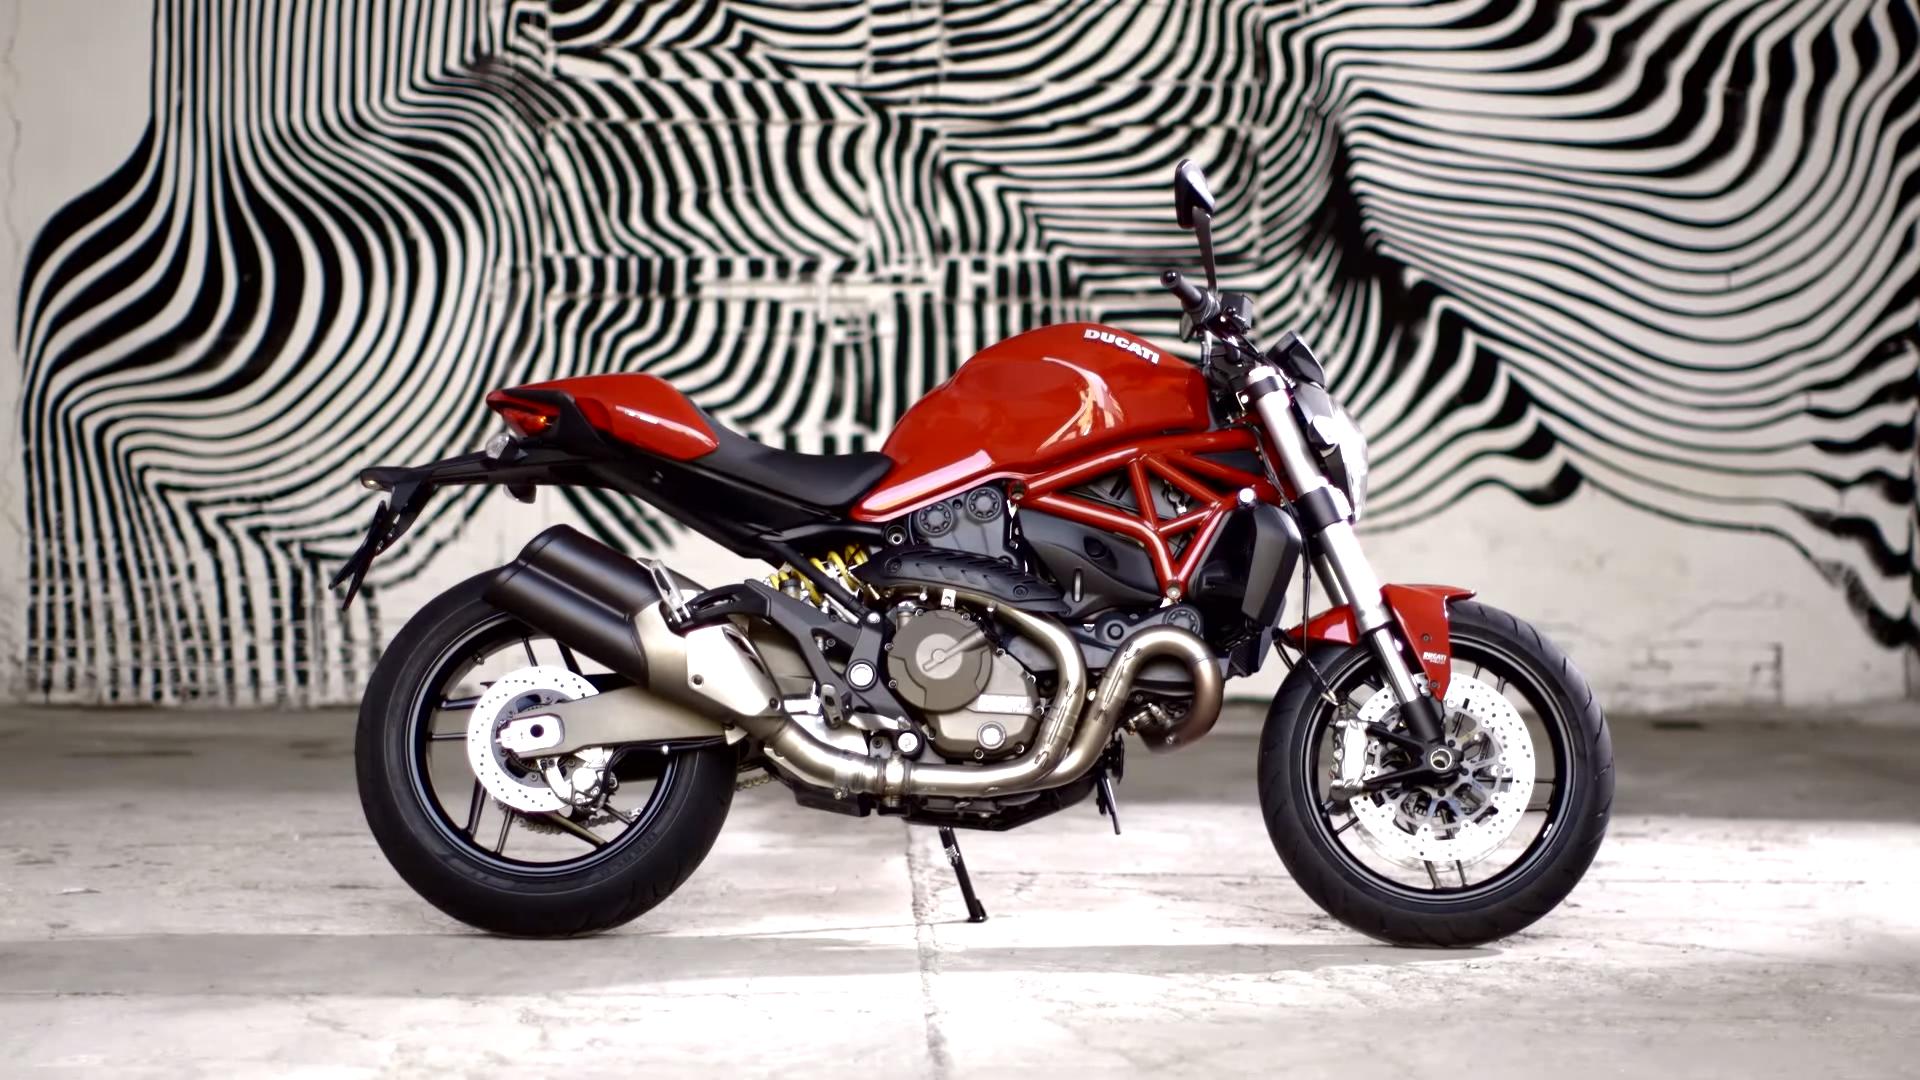 Wallpaper Car Motorcycle Motorcyclist Ducati Monster 821